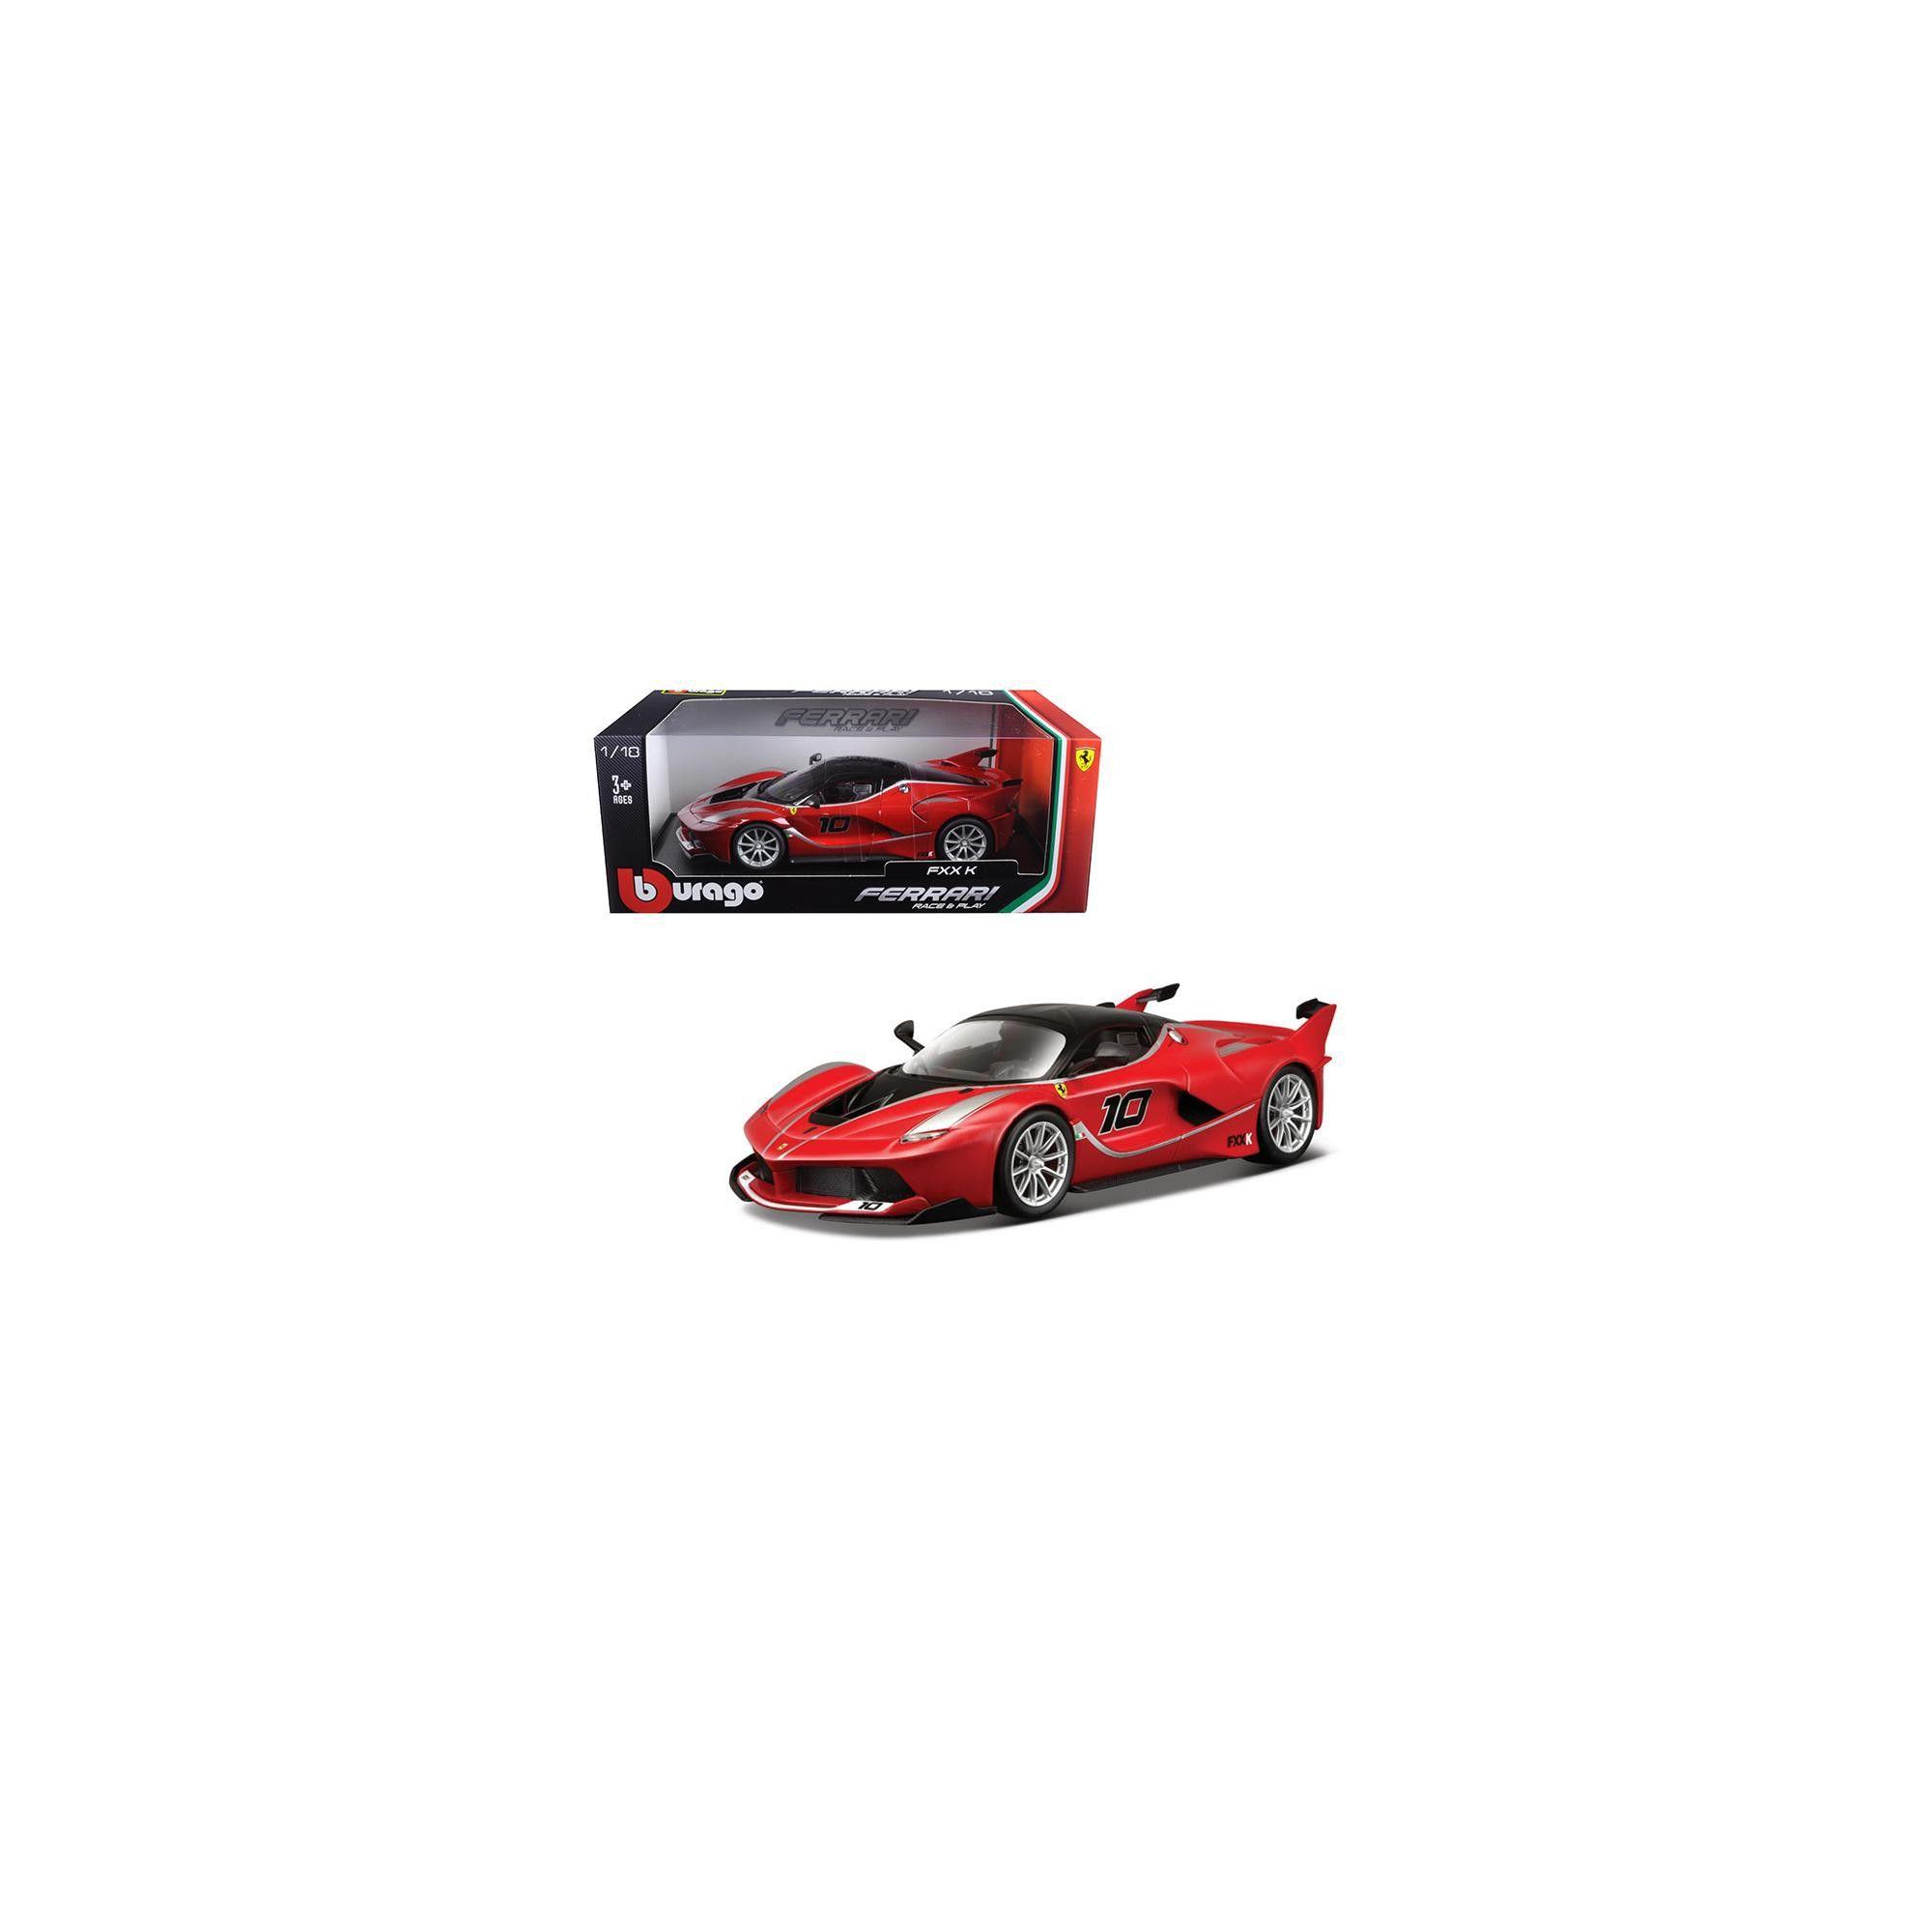 Ferrari FXX-K #10 Red 1/18 Diecast Model Car by Bburago #ferrarifxx